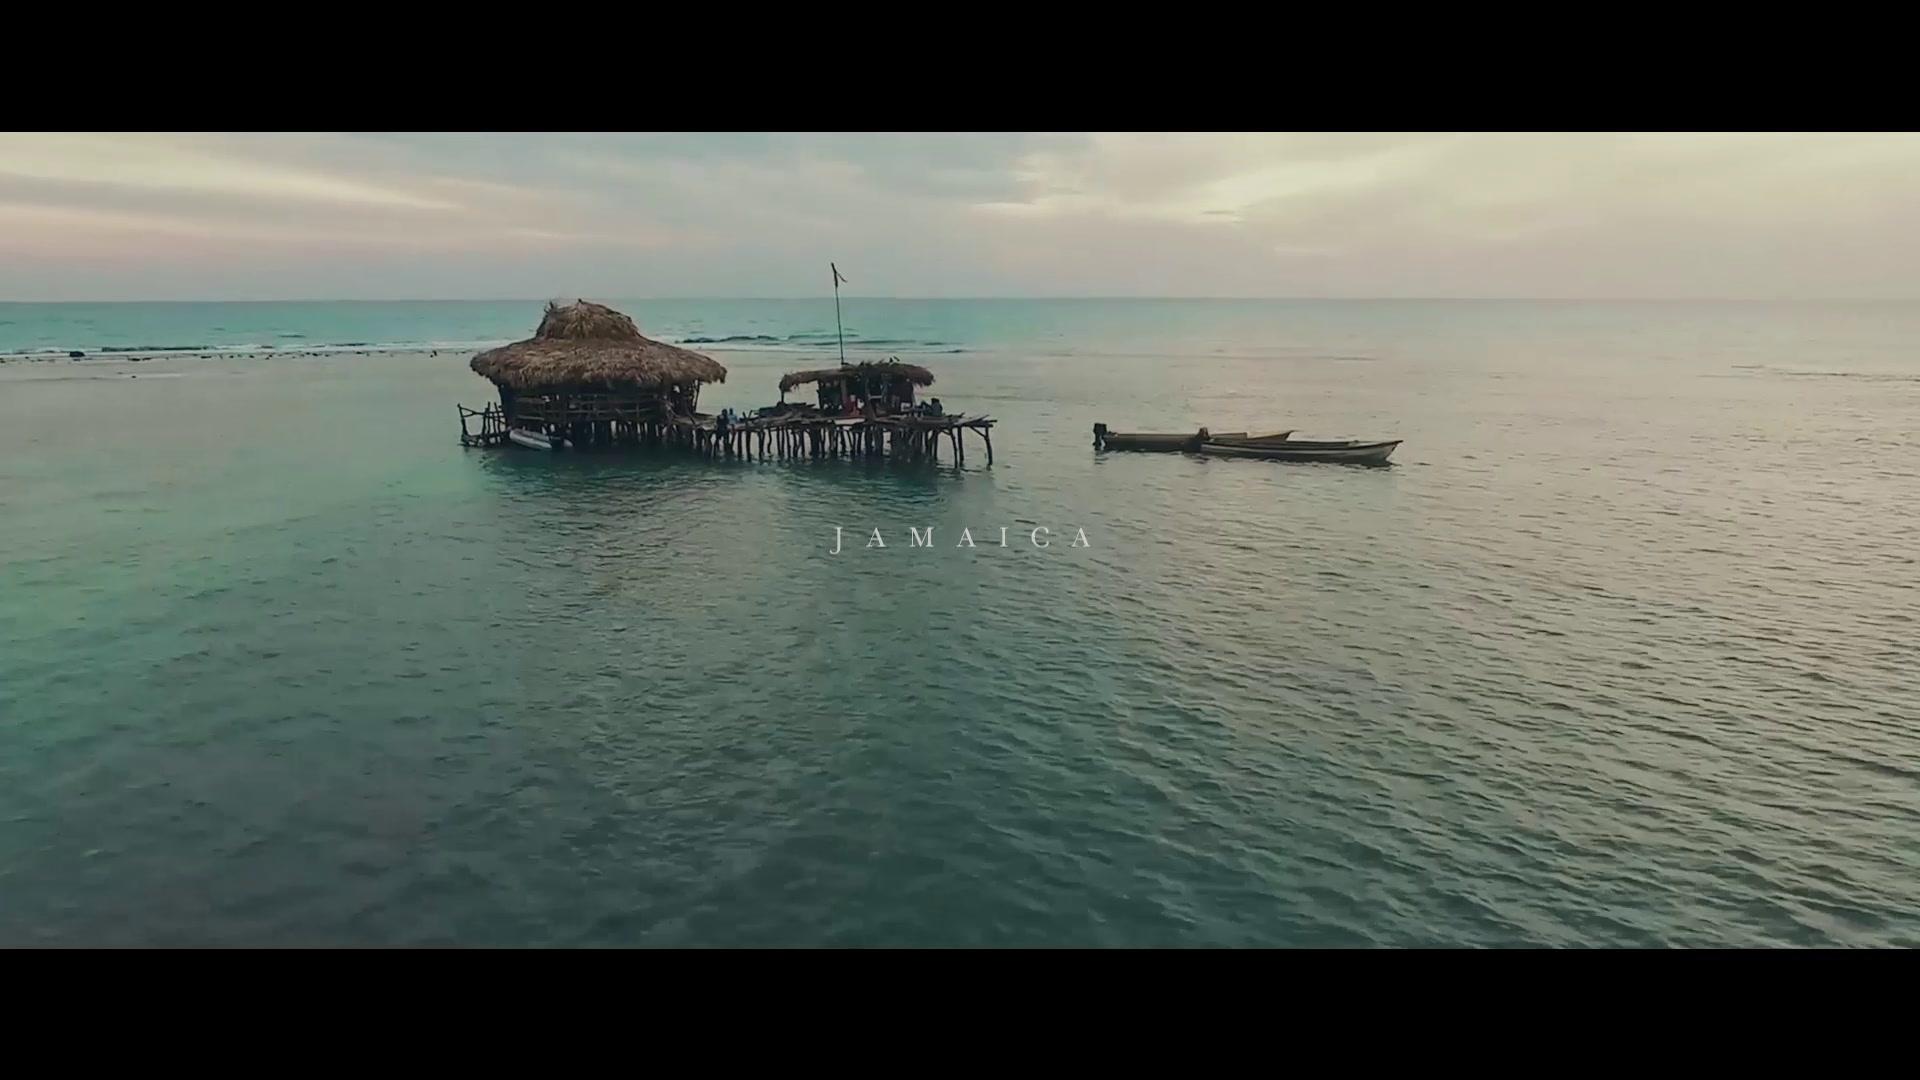 Kirstin + Guy | Jamaica, Jamaica | iberostar jamaica